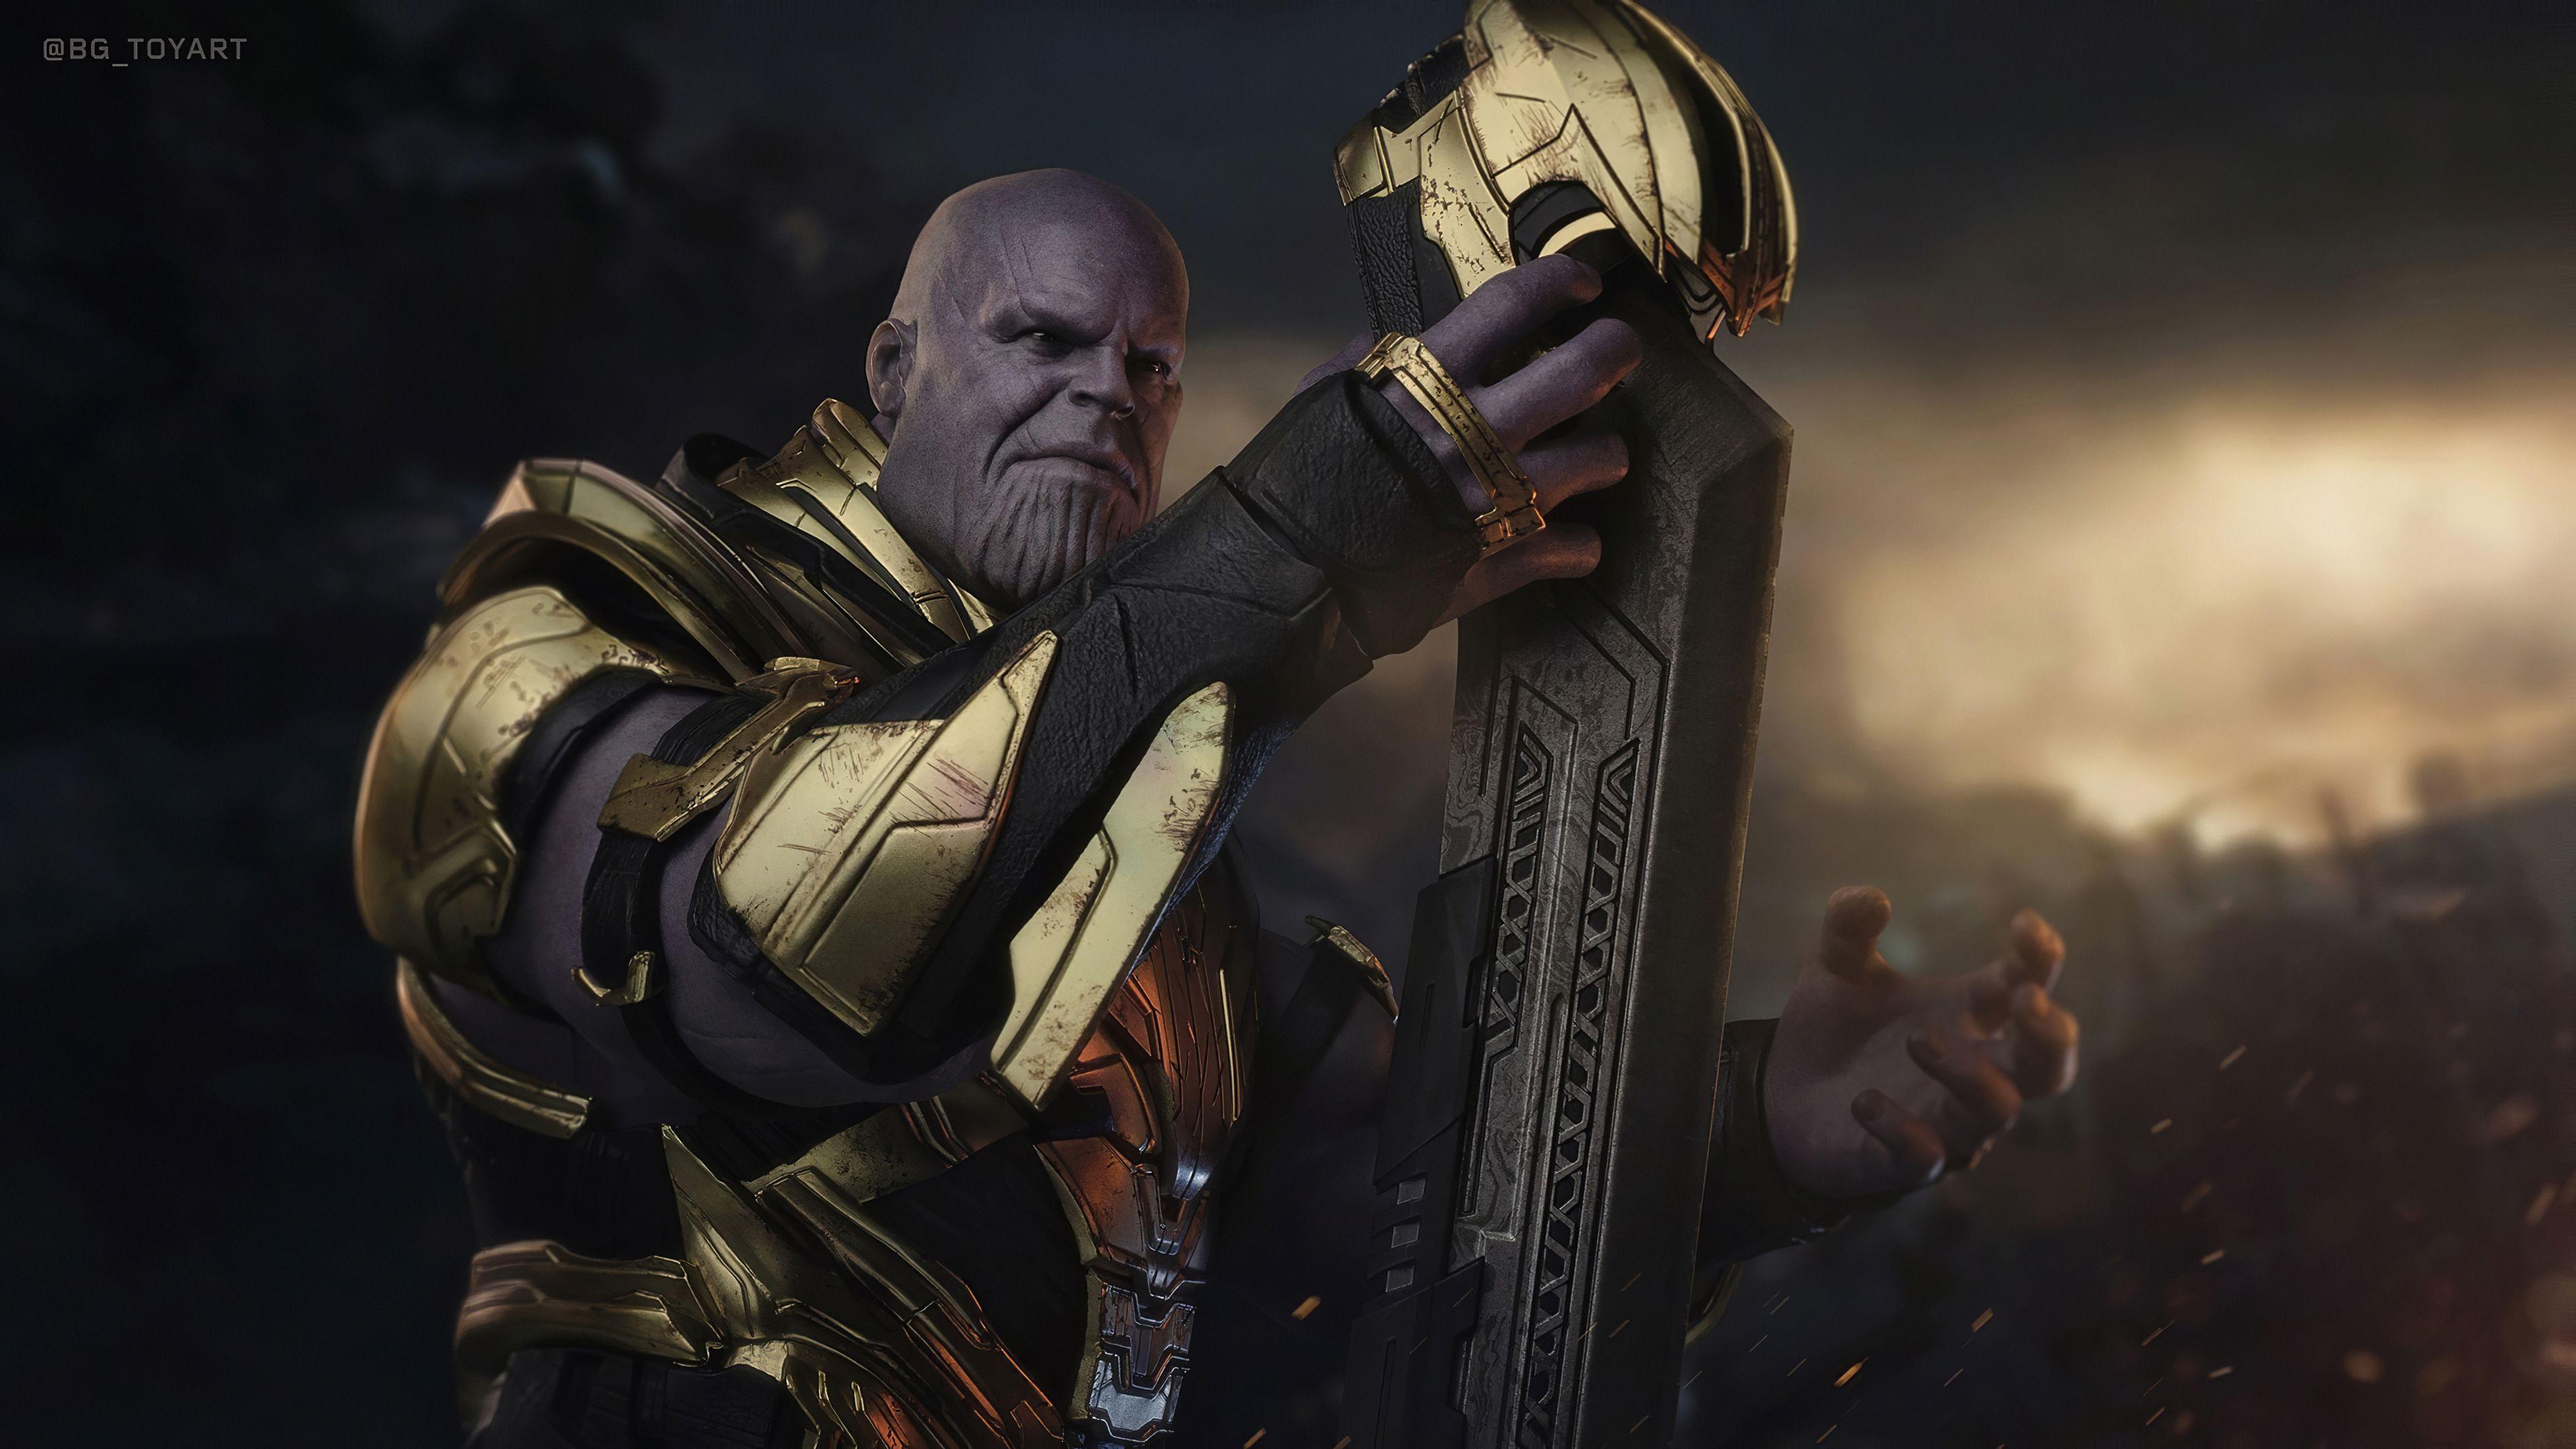 Thanos 2020 Art Thanos Wallpapers Thanos Phone Wallpapers 4k Thanos Art Wallpapers Thanos 4k Wallpapers In 2020 Art Wallpaper Hero Wallpaper Phone Wallpaper